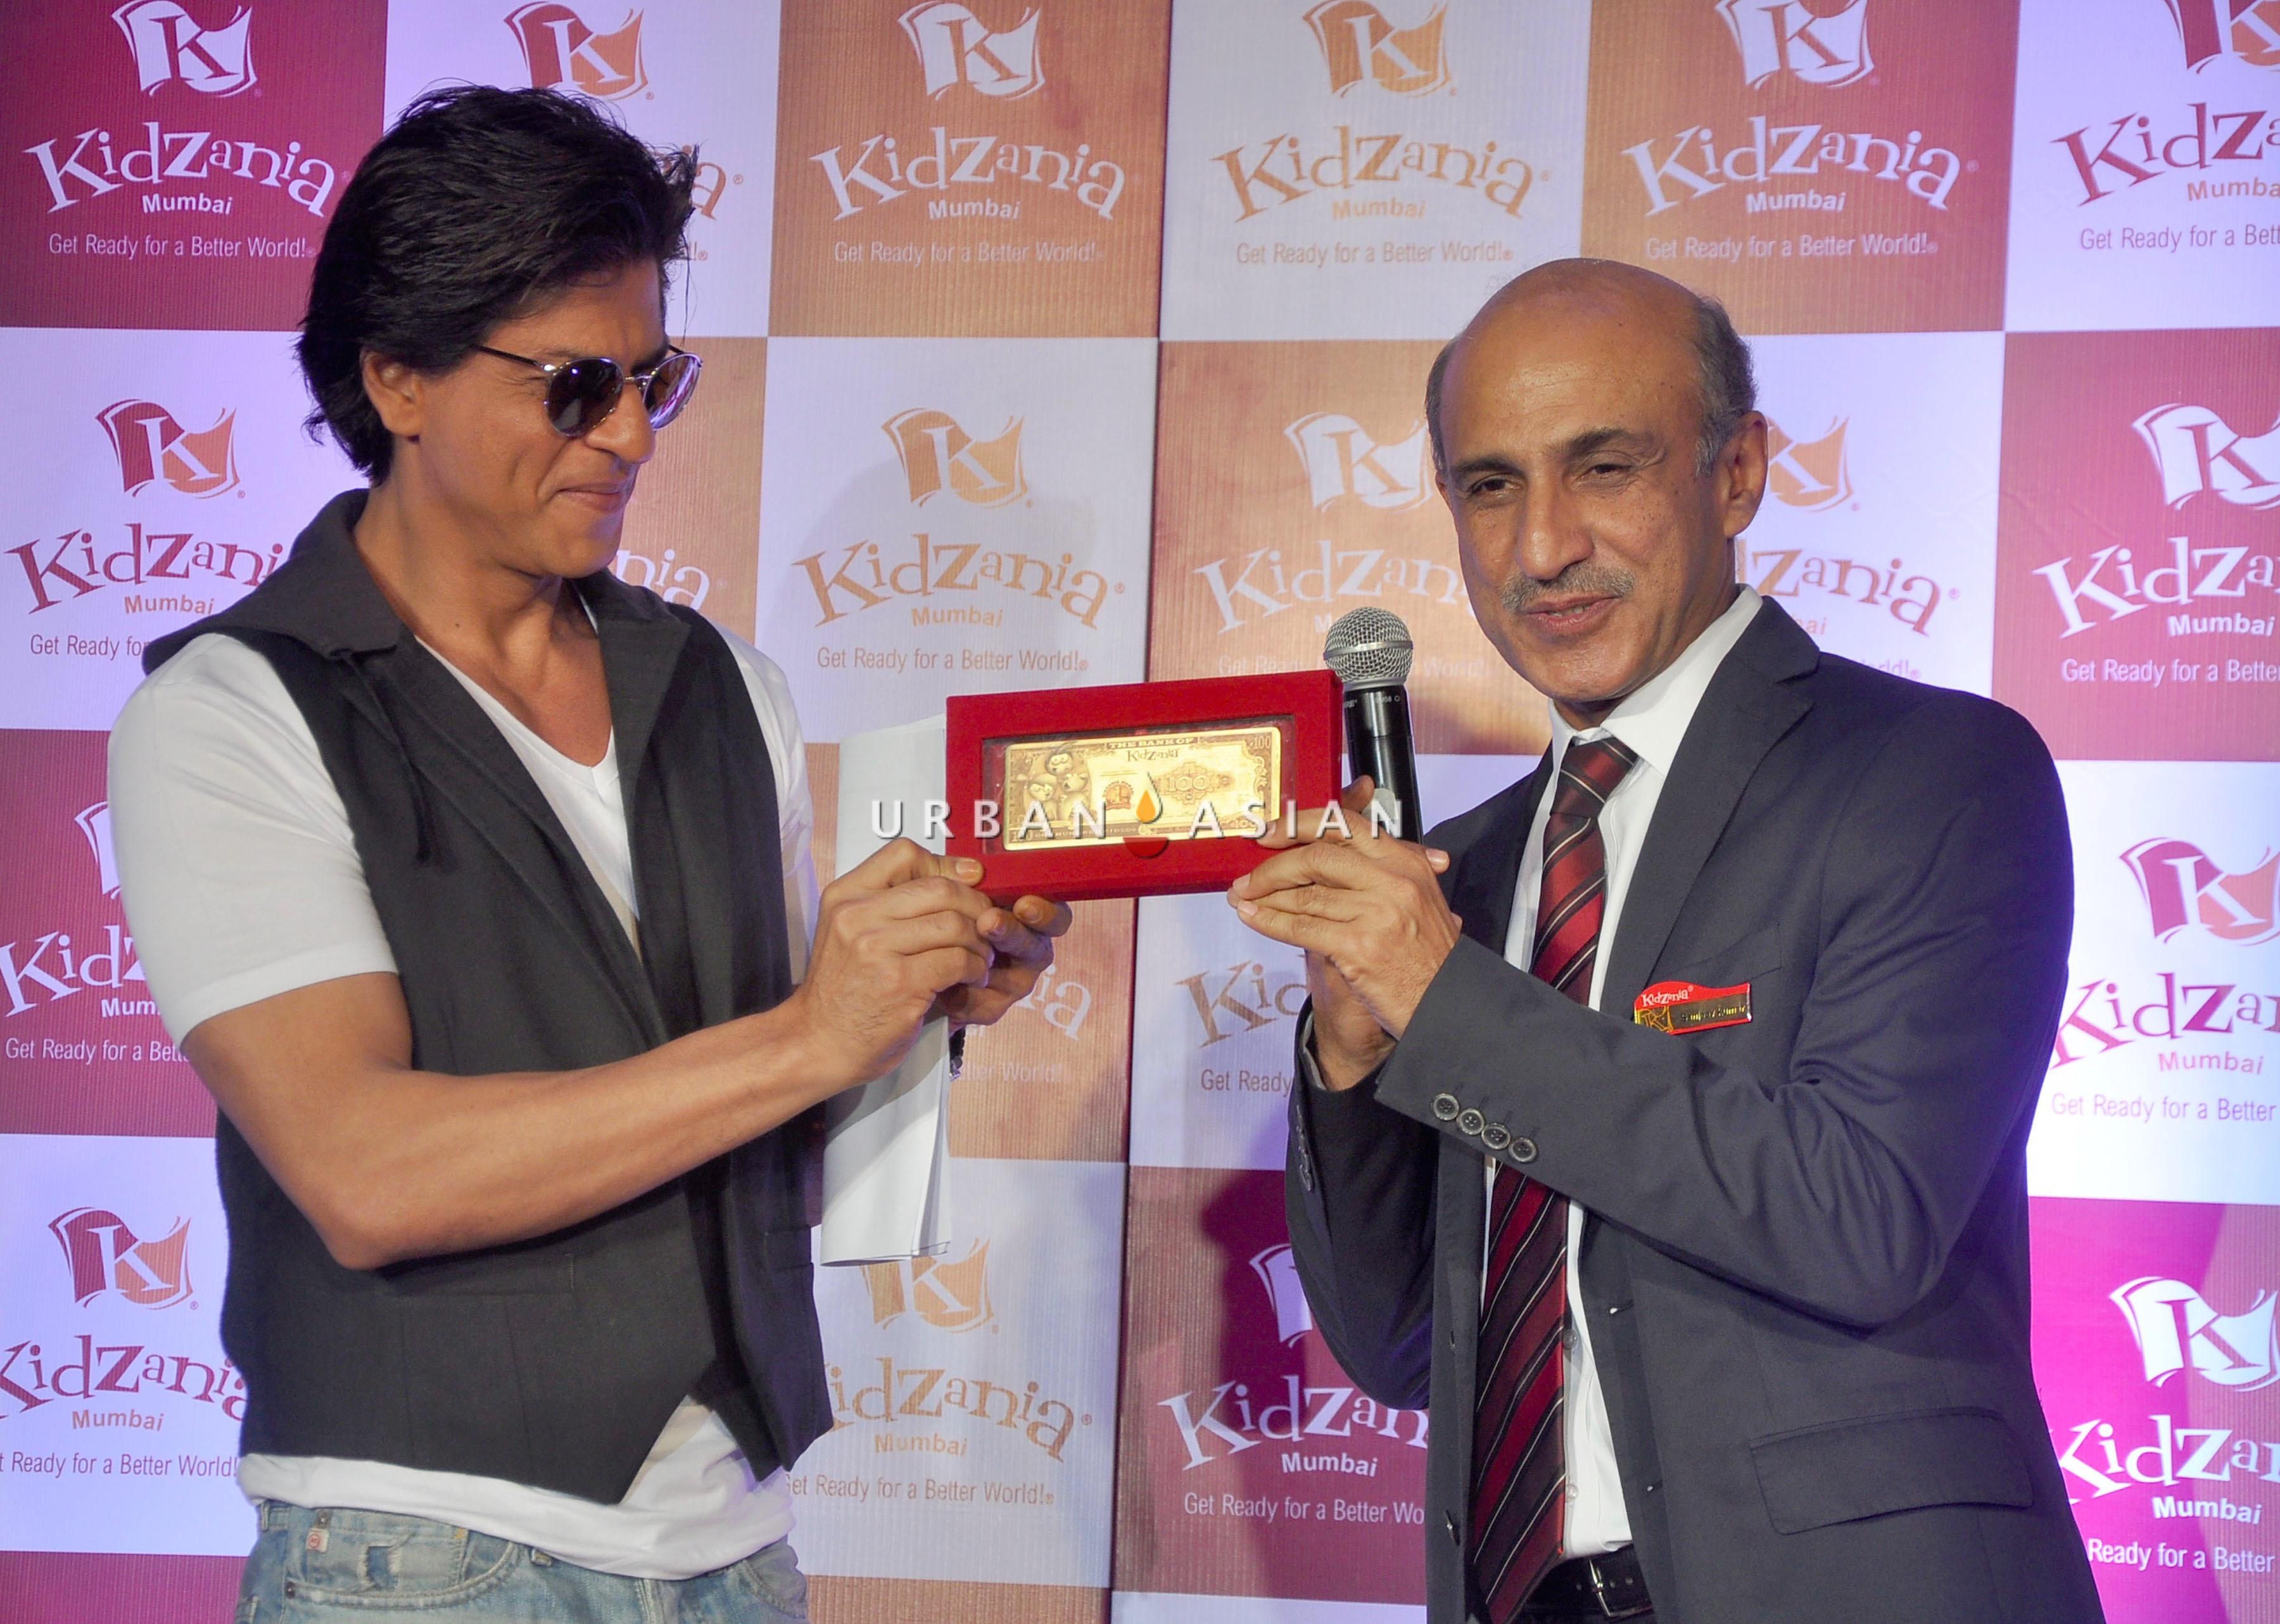 SRK AND SANJEEV KUMAR, DIRECTOR AND CEO OF KIDZANIA INDIA DSC_5900